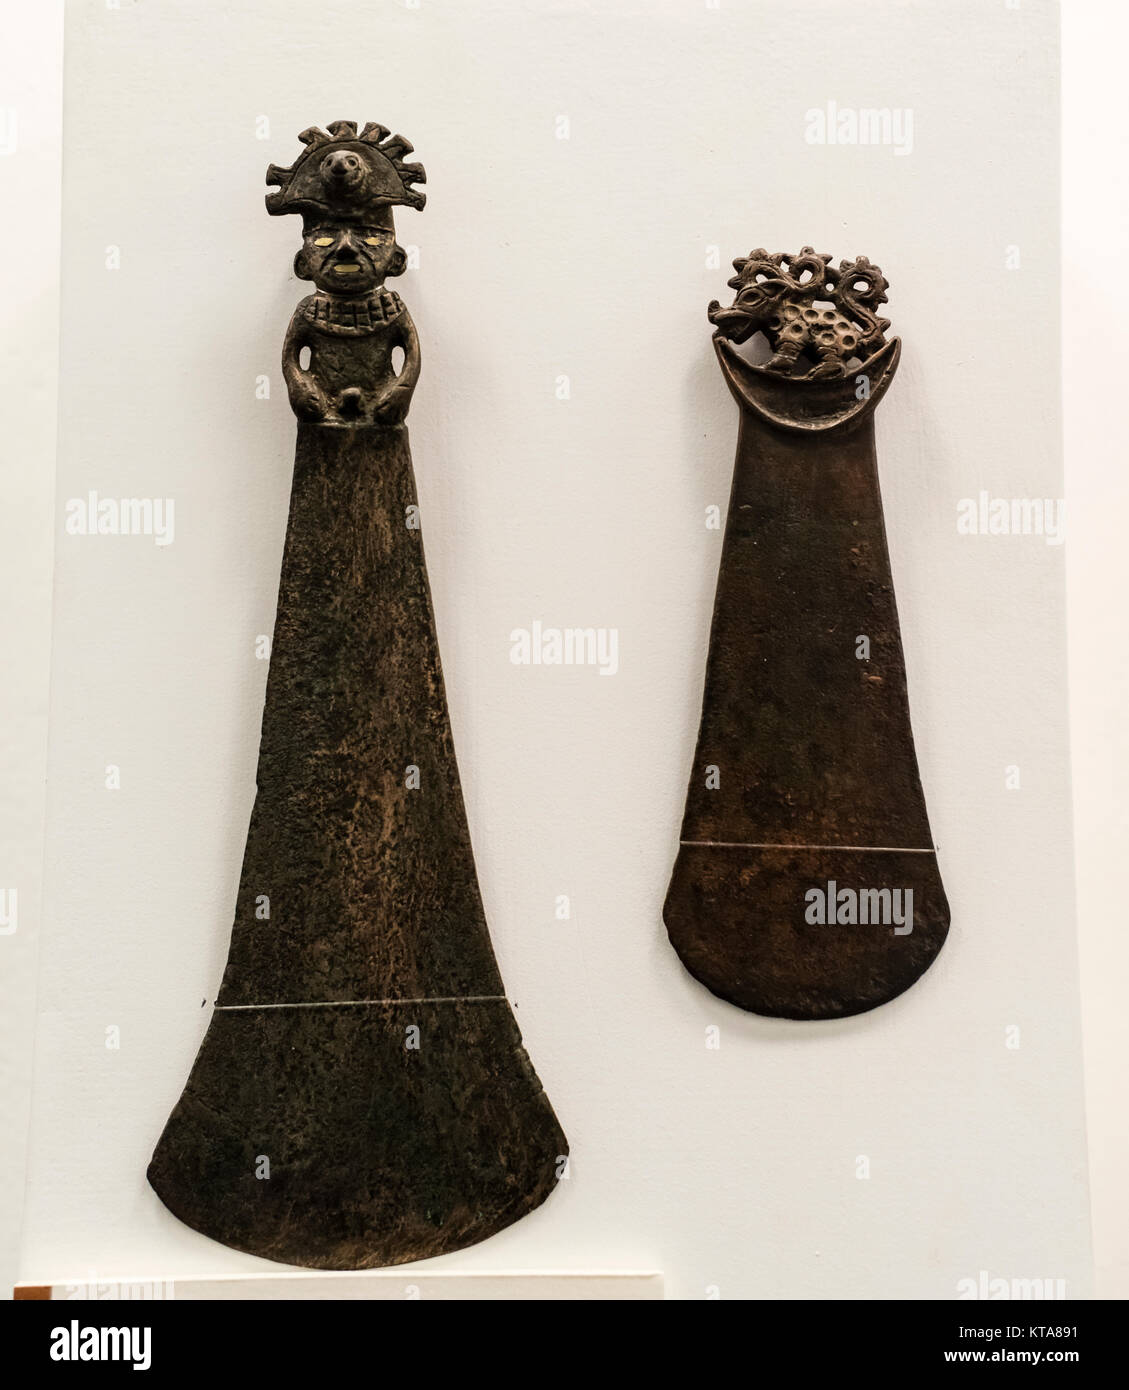 Ceremonial knives, Moche culture 100 AC-800 AC Perú - Stock Image